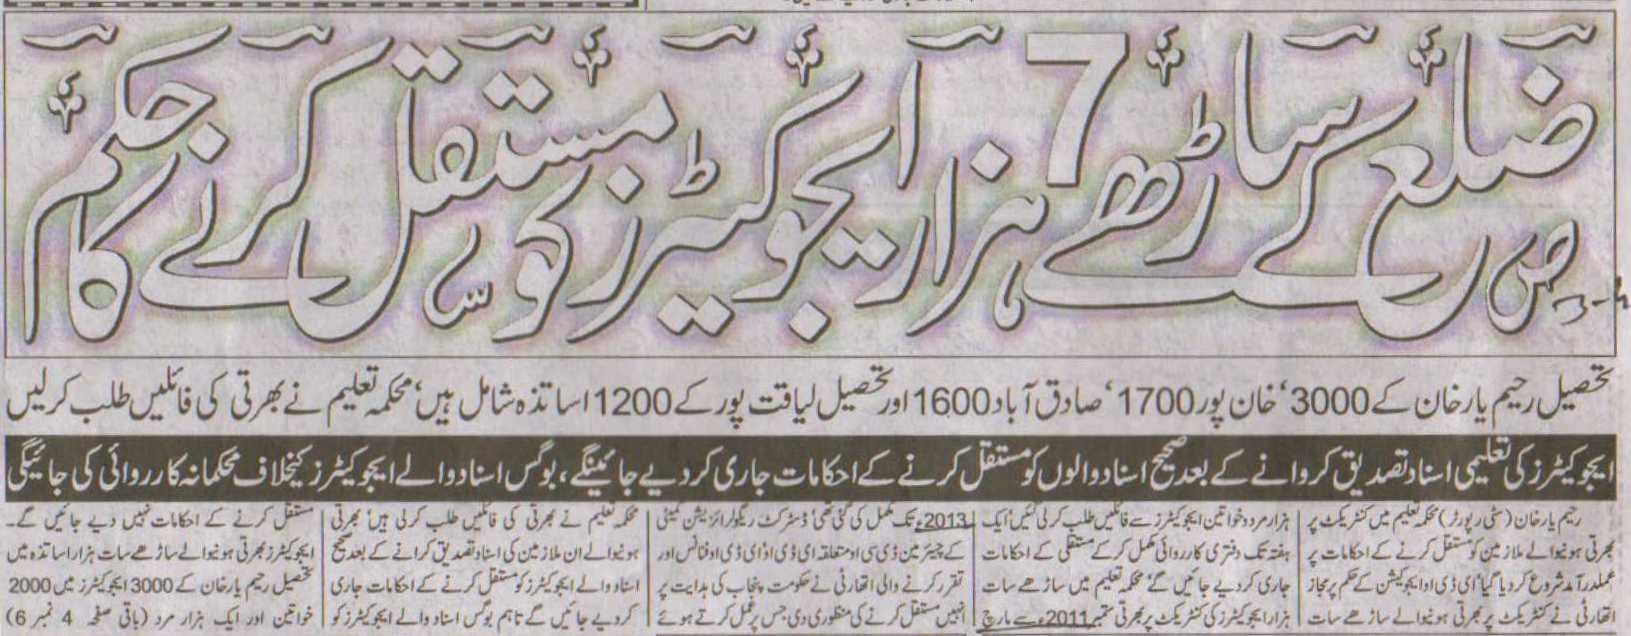 EDO Education ordered to permenent 7500 Educators in Rahim Yar Khan